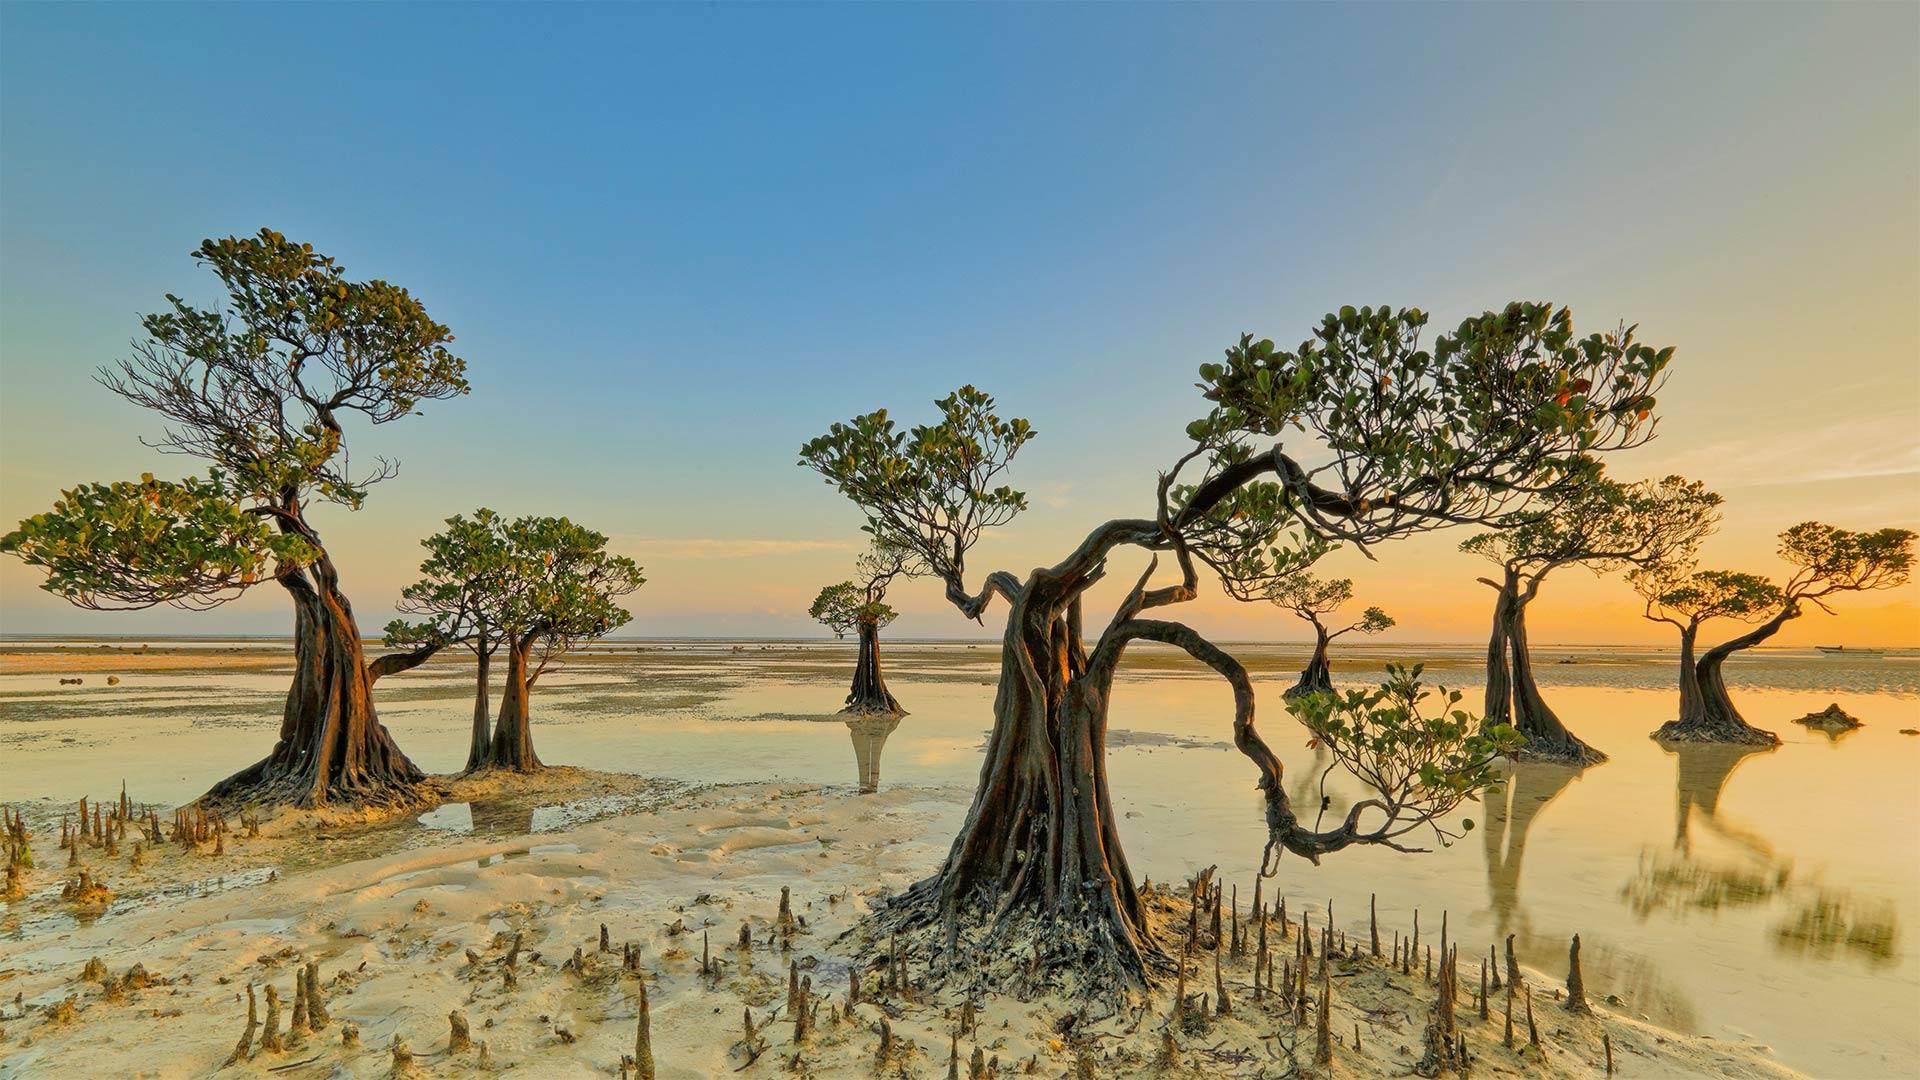 Mangrove trees, Walakiri Beach, Sumba island, Indonesia (? Tengguo Wu/Getty Images)